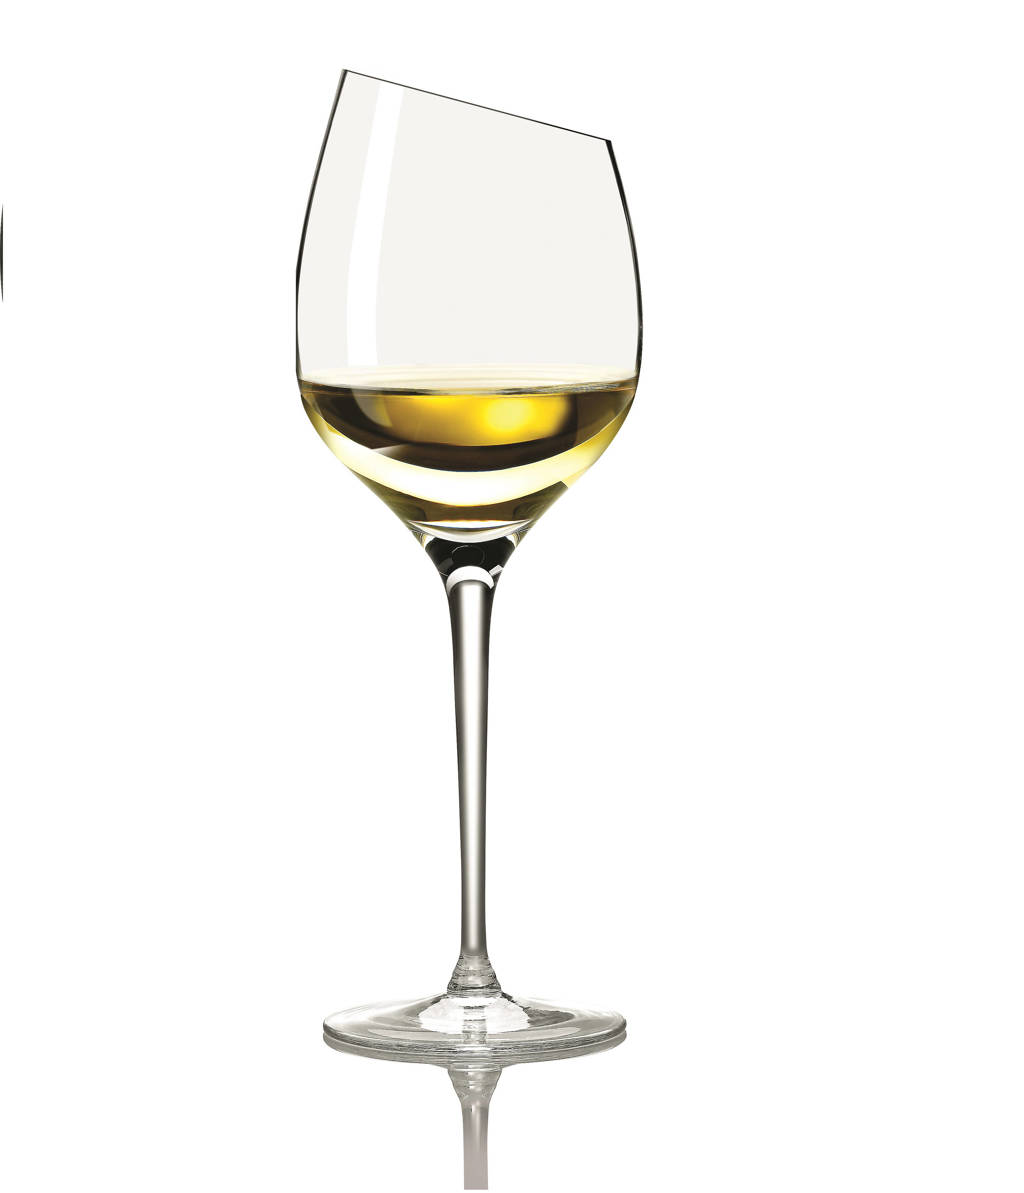 Eva Solo wijnglas Sauvignon Blanc 30 cl, Transparant